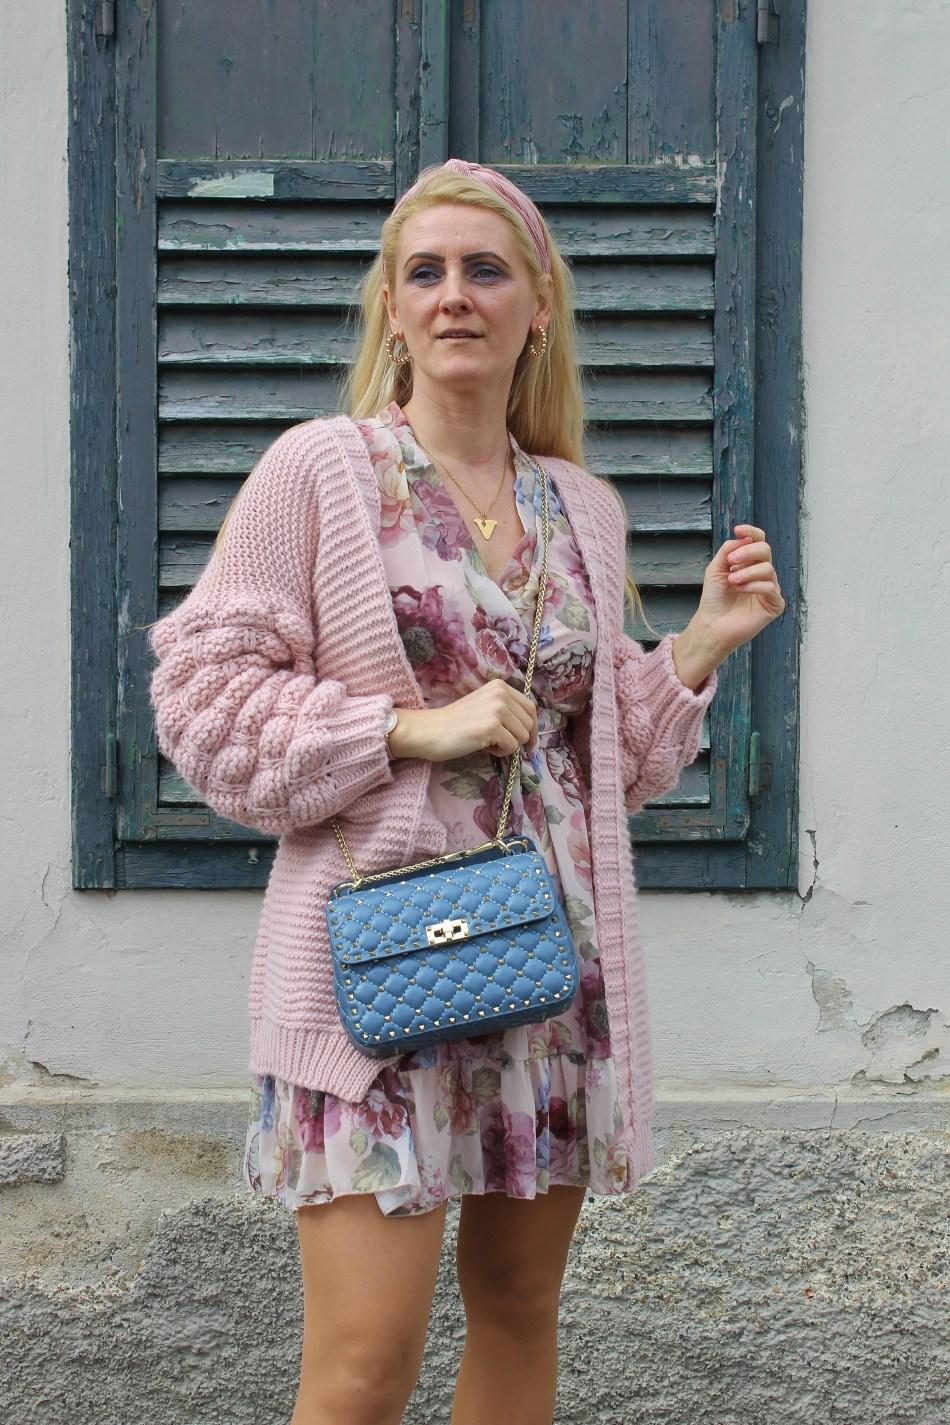 LucieandLeo-Dress-Blumenprint-Kleid-Frühlingslook-Cardigan-Rosa-Boots-Nakd-Fashion-carrieslifestyle-Tamara-Prutsch